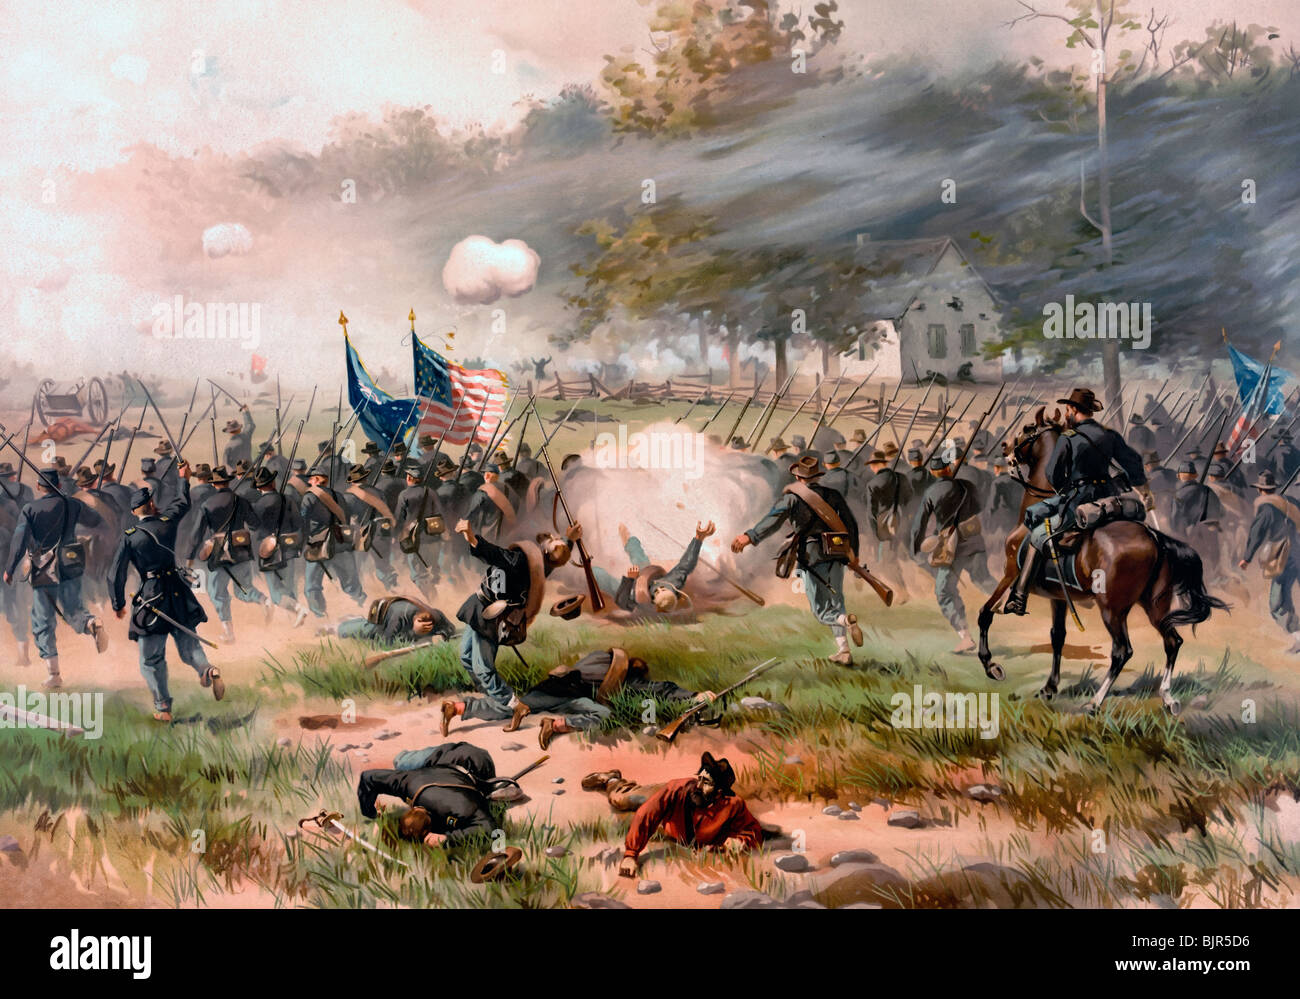 Battle of Antietam or Sharpsburg, fought on September 17, 1862 during the USA Civil War - Stock Image